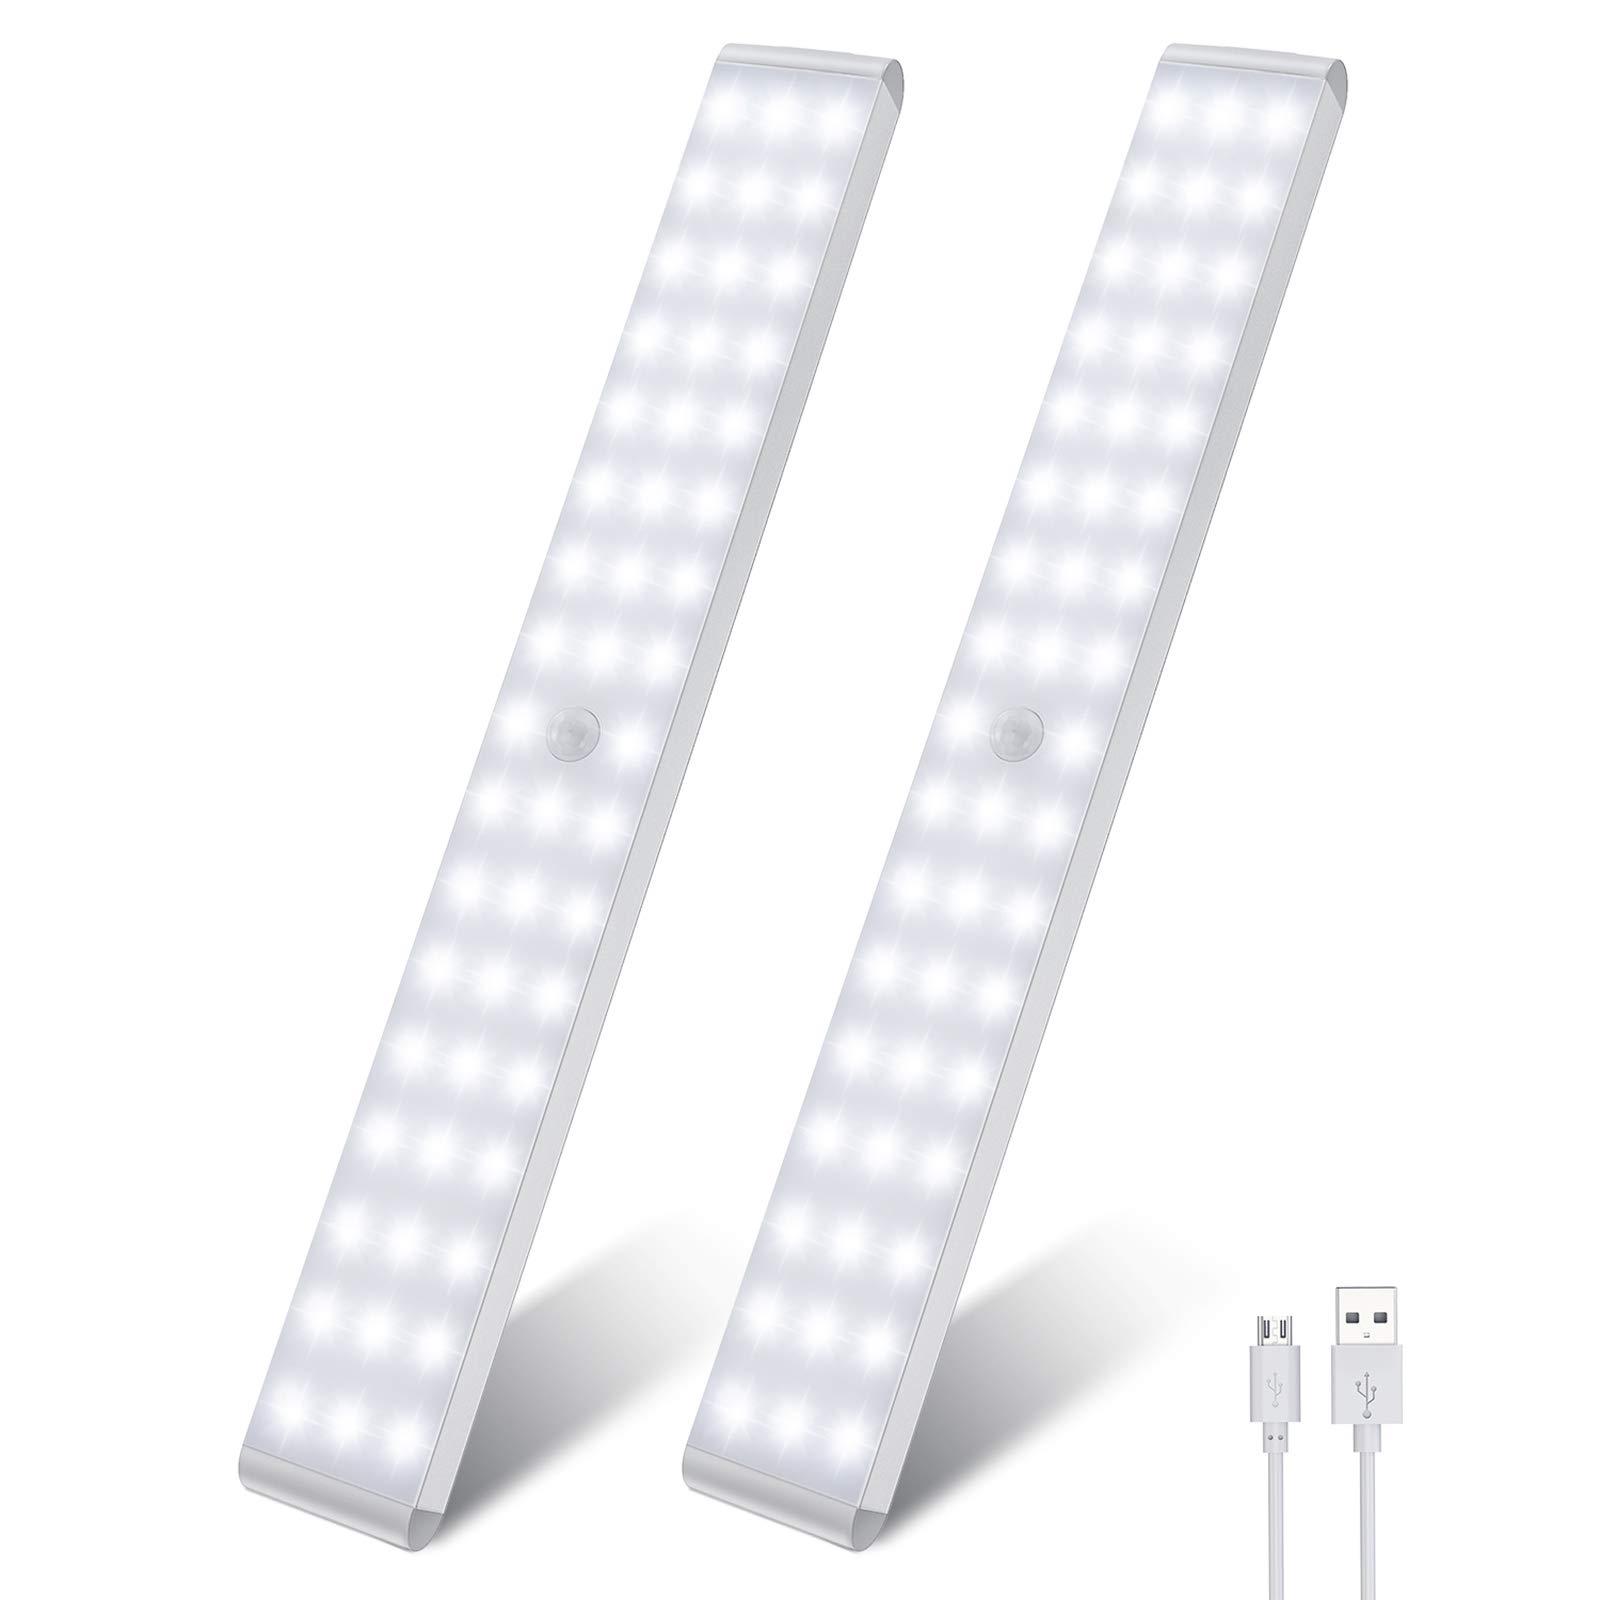 $12.99 LED Closet Light,50-LED Dimmer Rechargeable Motion Sensor Under Cabinet Lights Wireless Stick-Anywhere Night Light Bar W/1500mAh Battery (2 Packs) At Amazon. Free Ship.